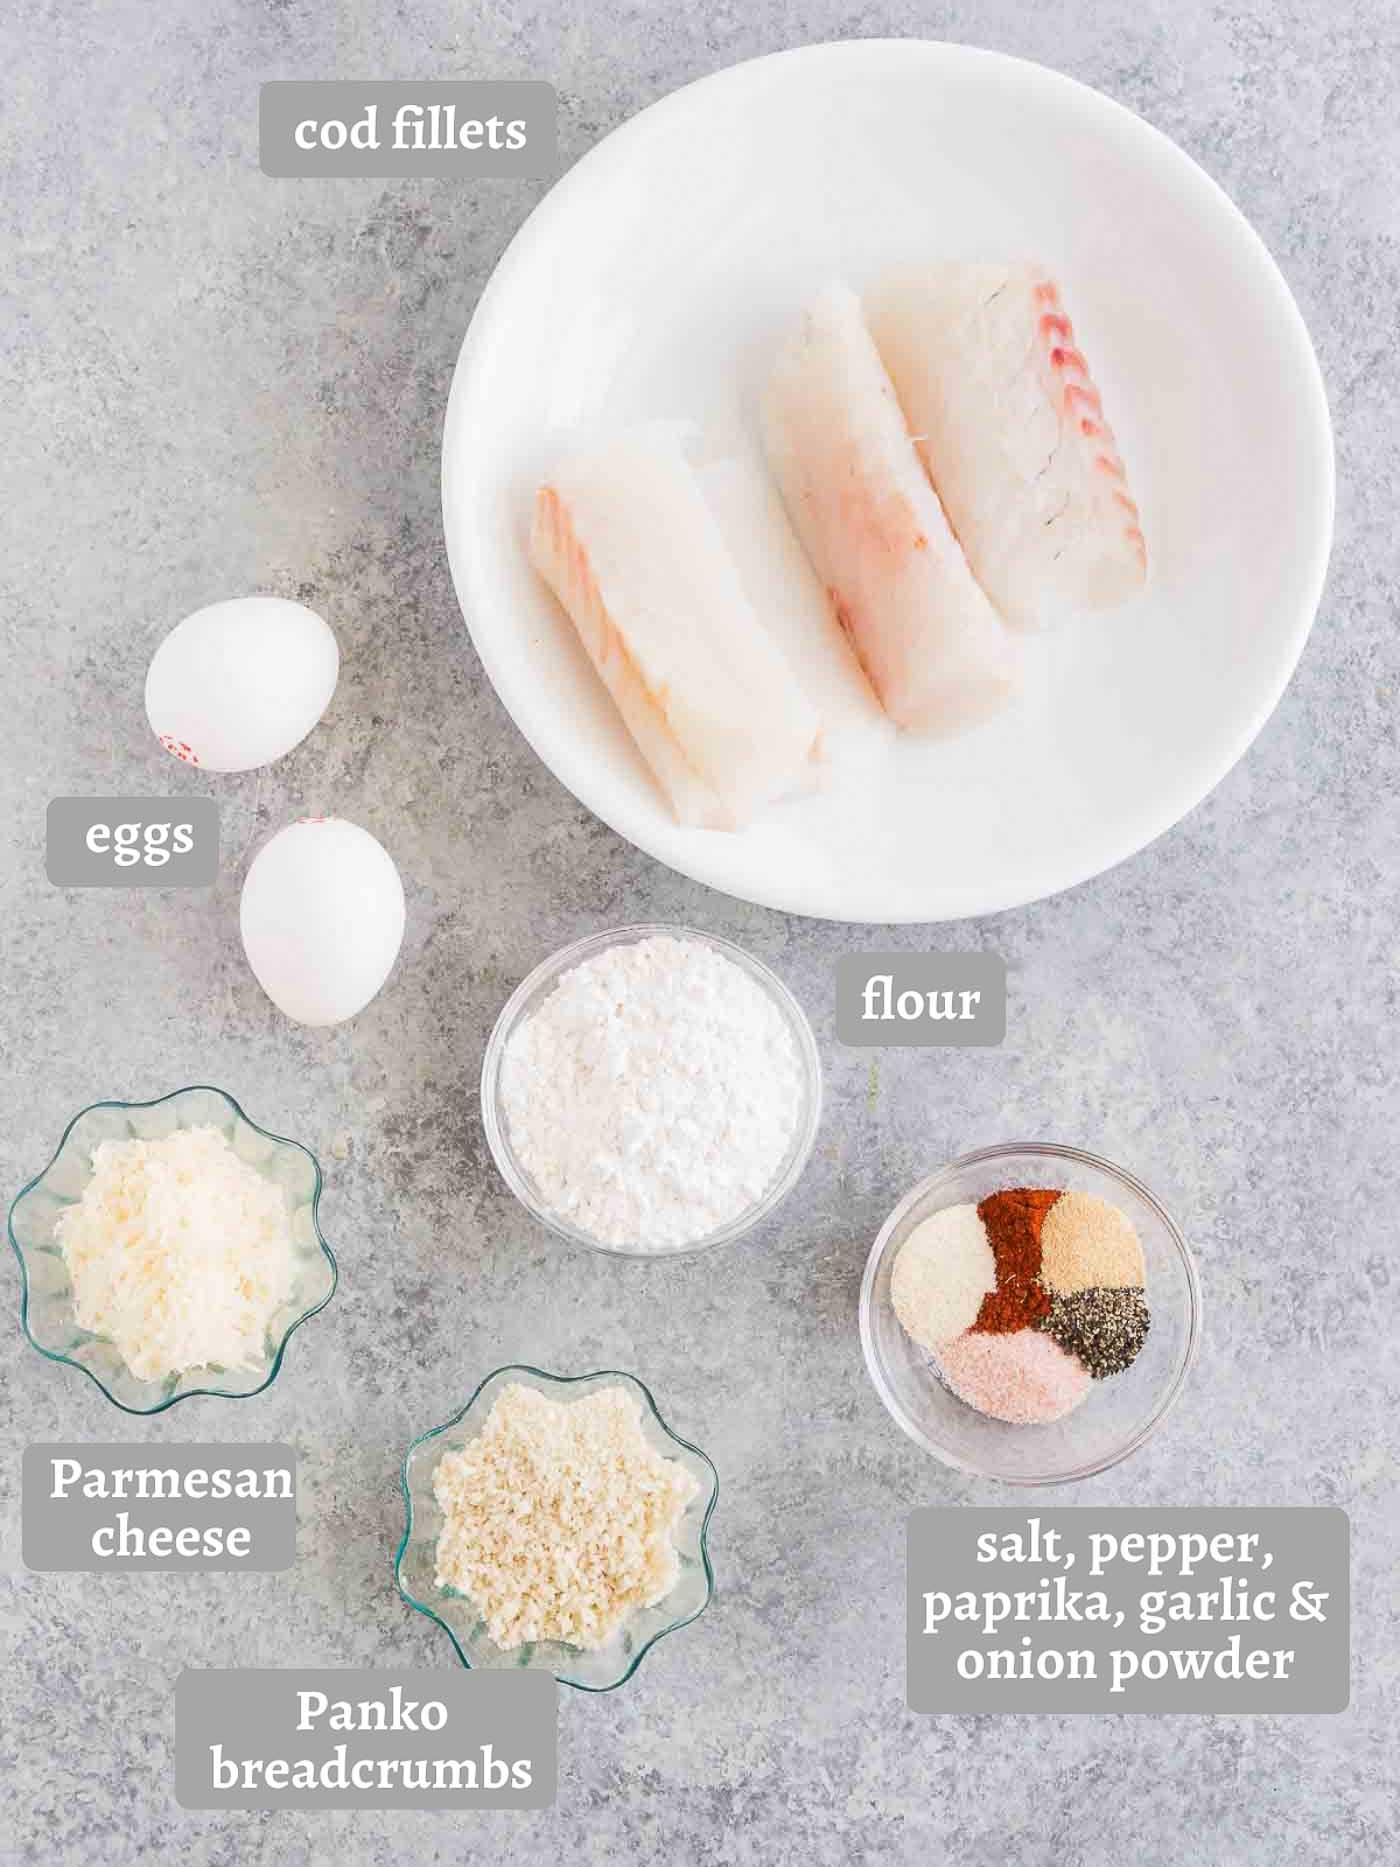 ingredients for fish sticks